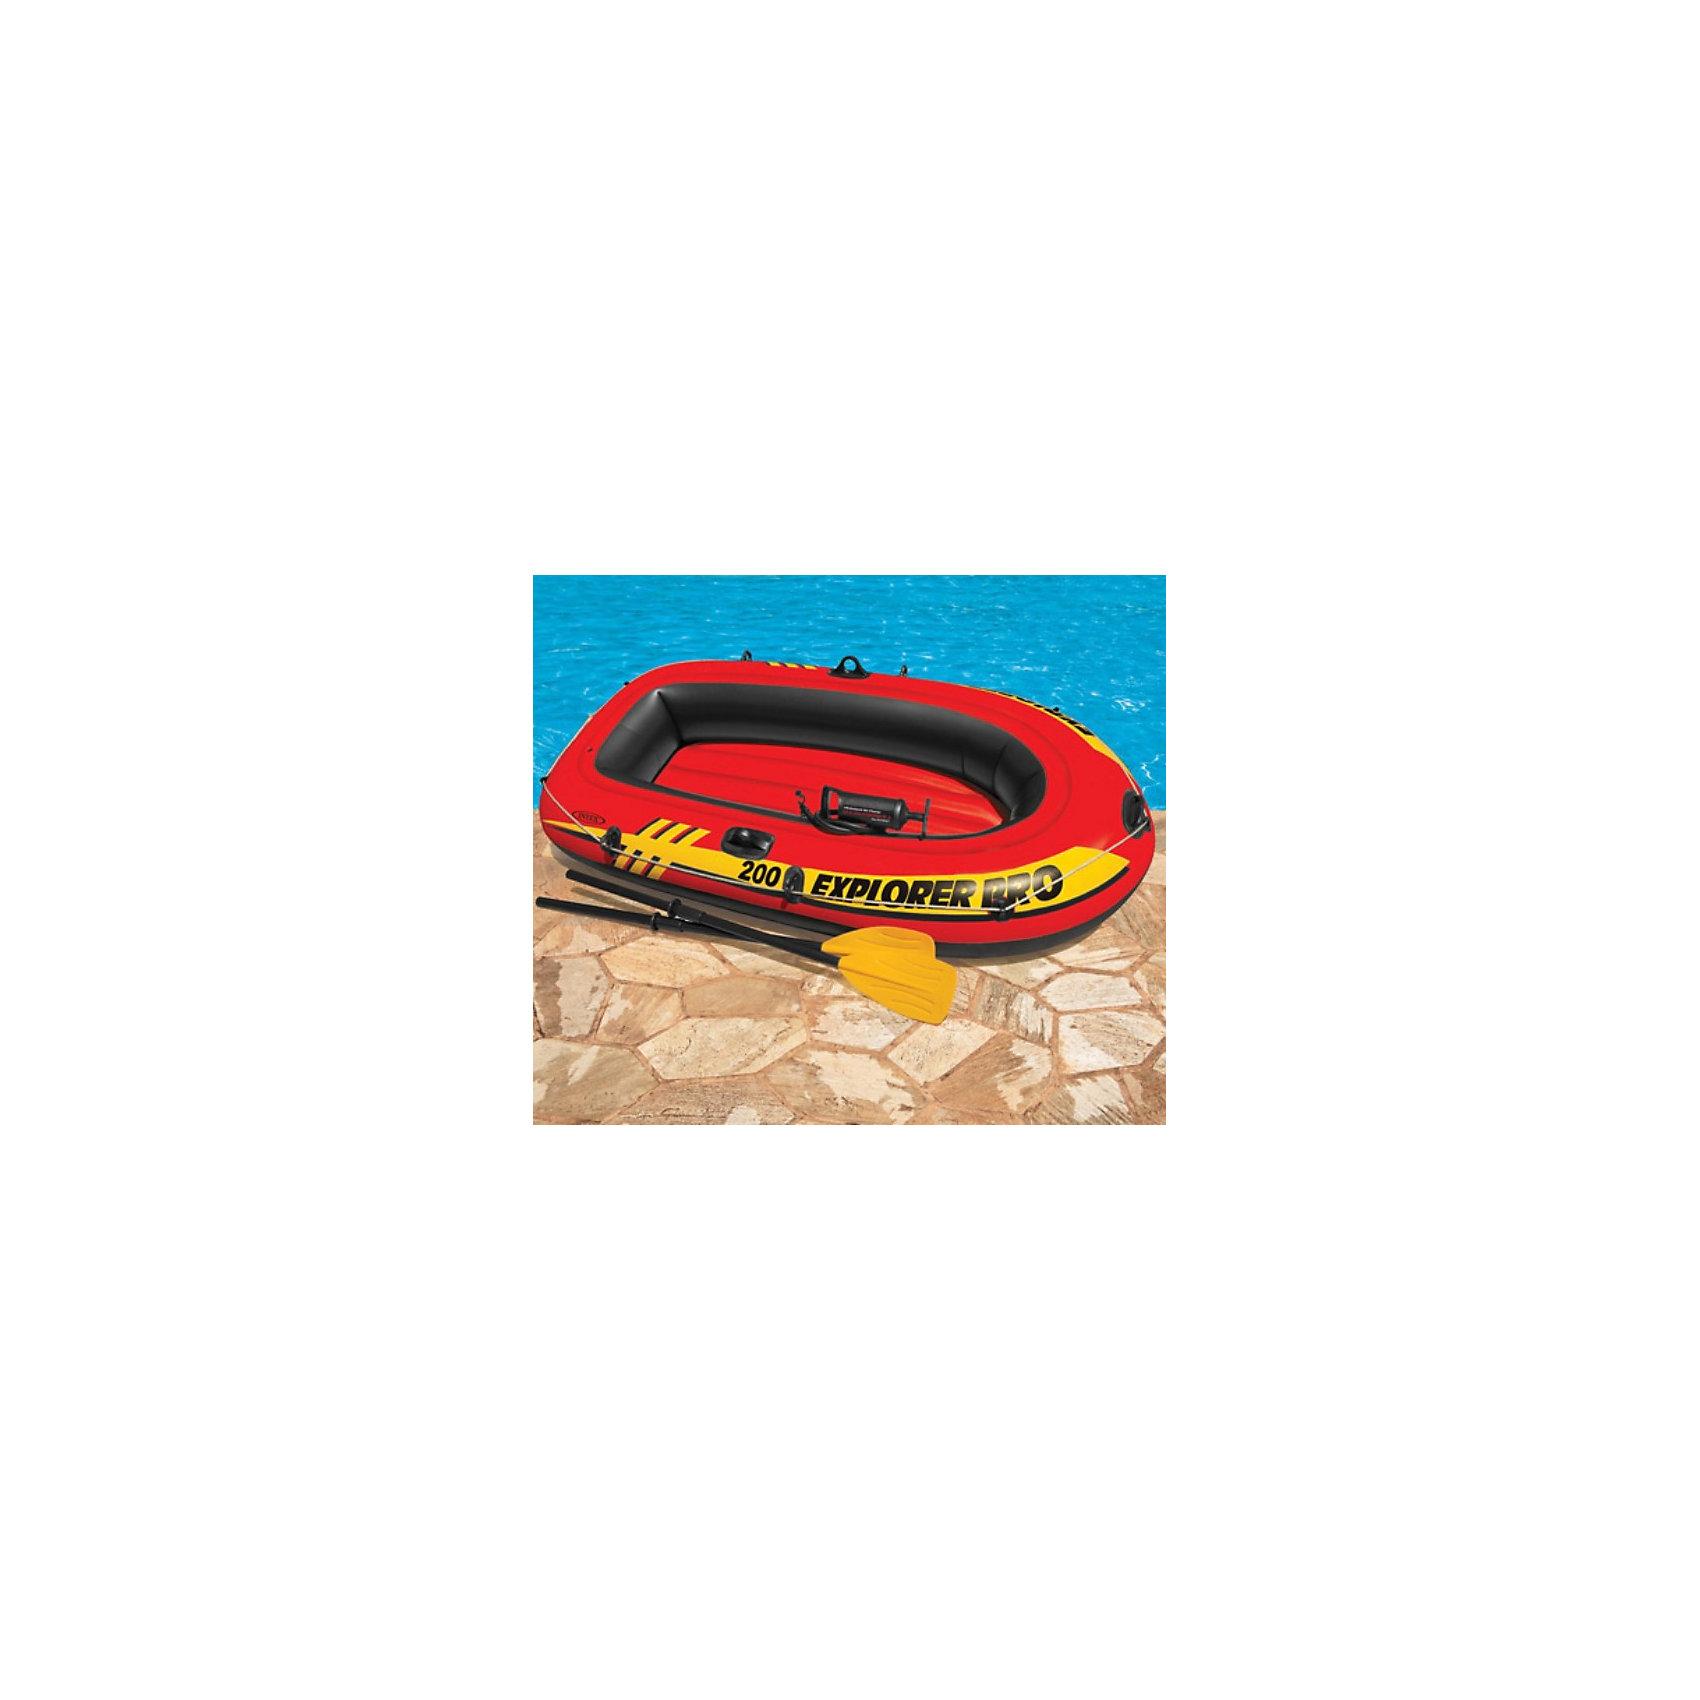 Intex Двухместная лодка с веслами Explorer 200, Intex лодка надувная intex seahawk 2 68347